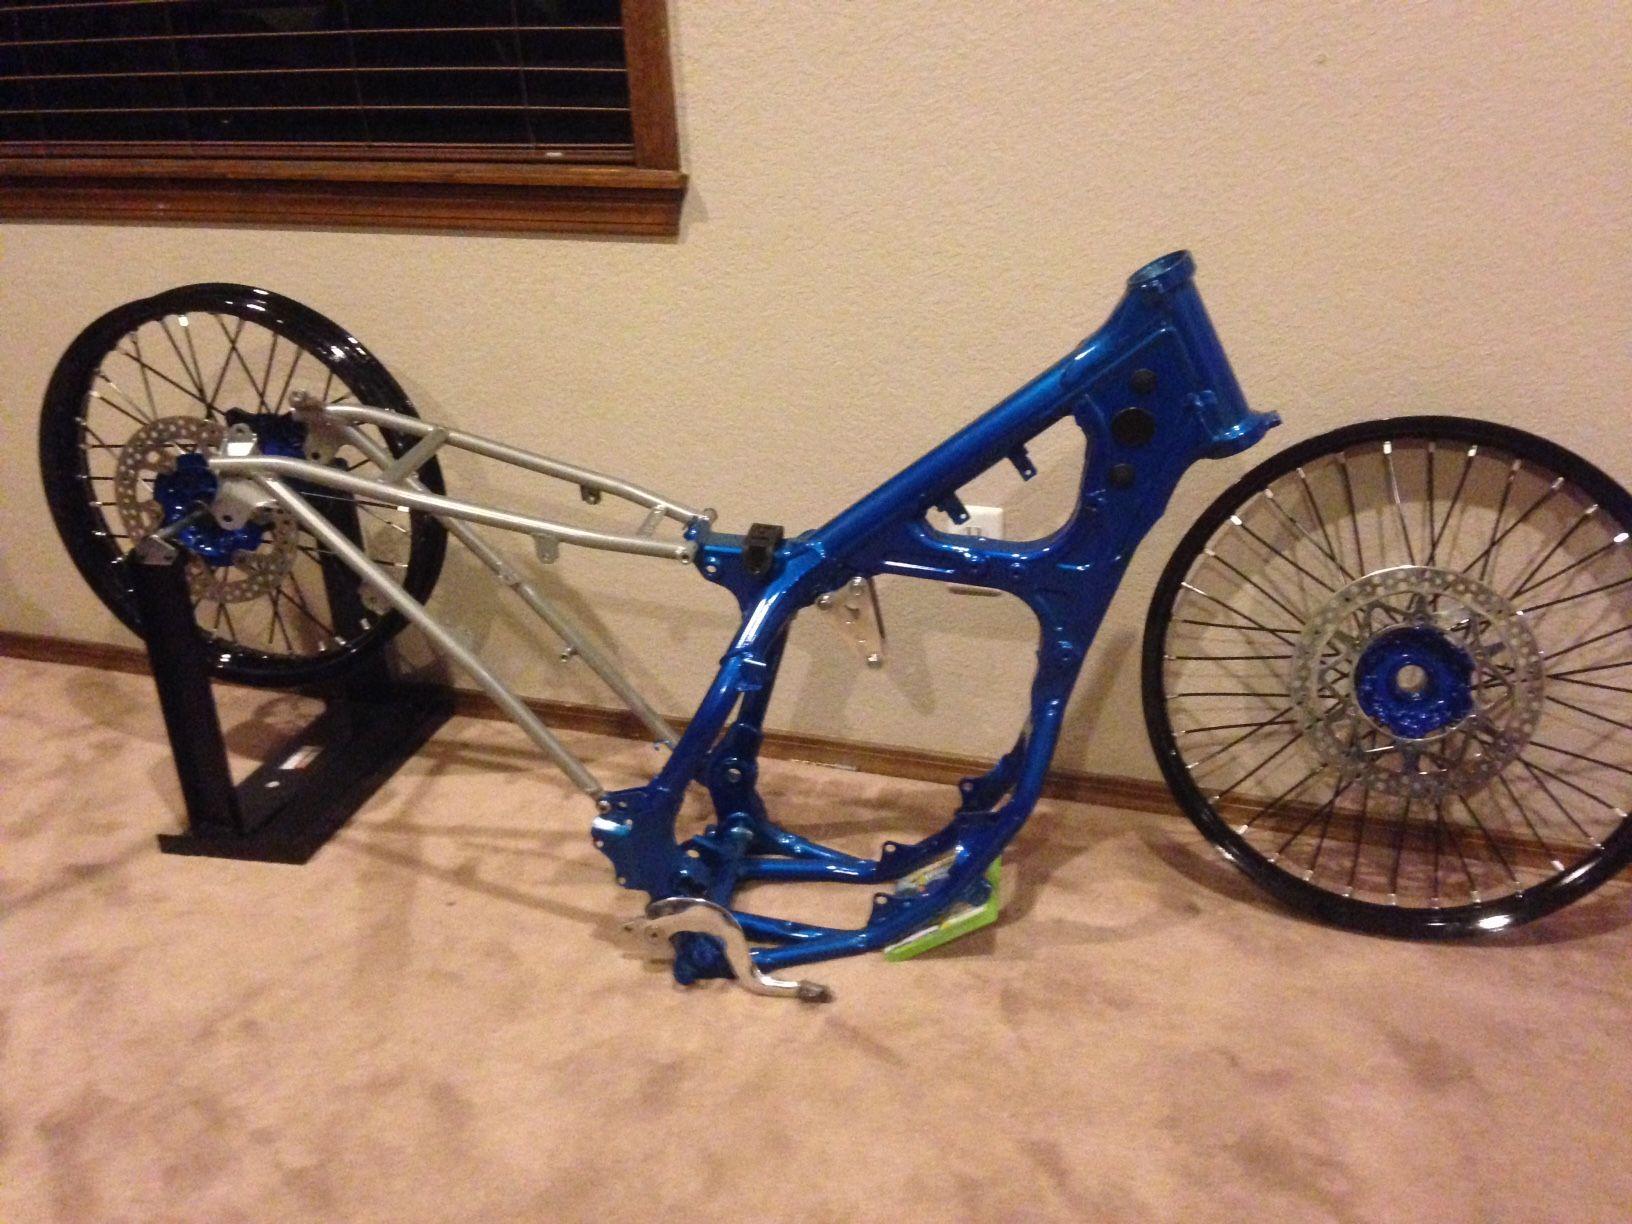 how to apply ceramic coating on bike